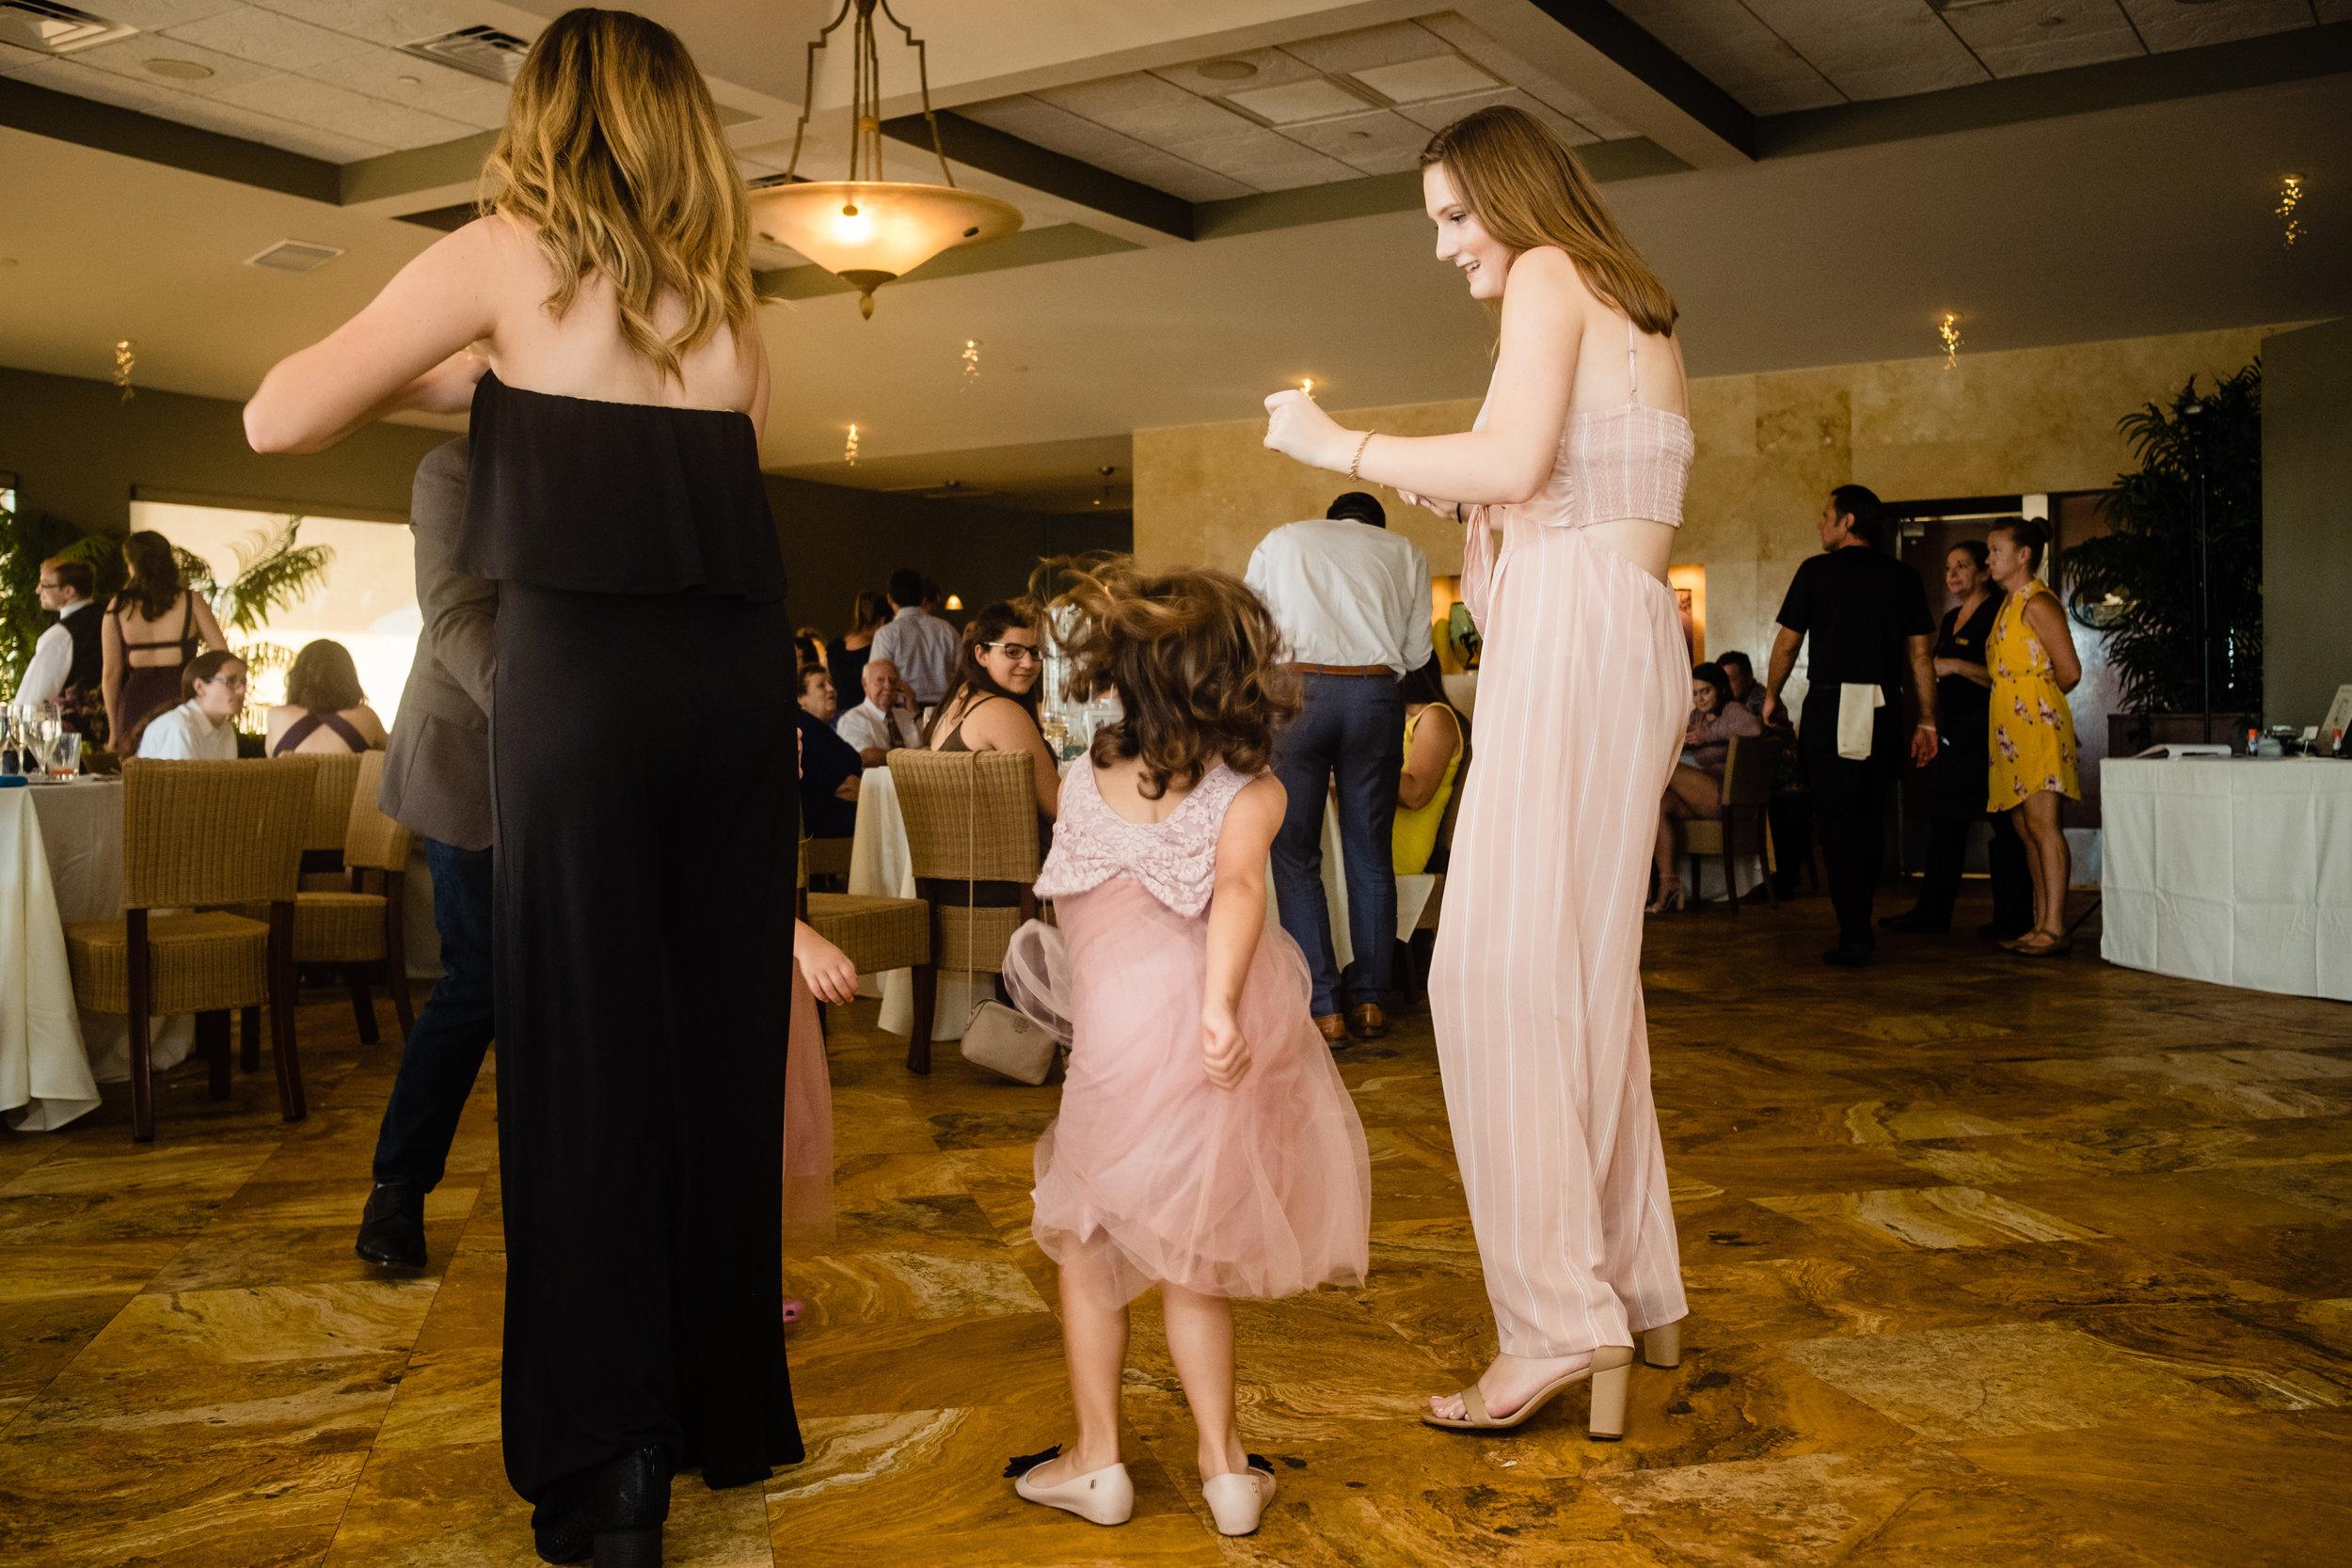 HAH_Zoe and Daniel_Clearwater Wedding_655_2018.jpg